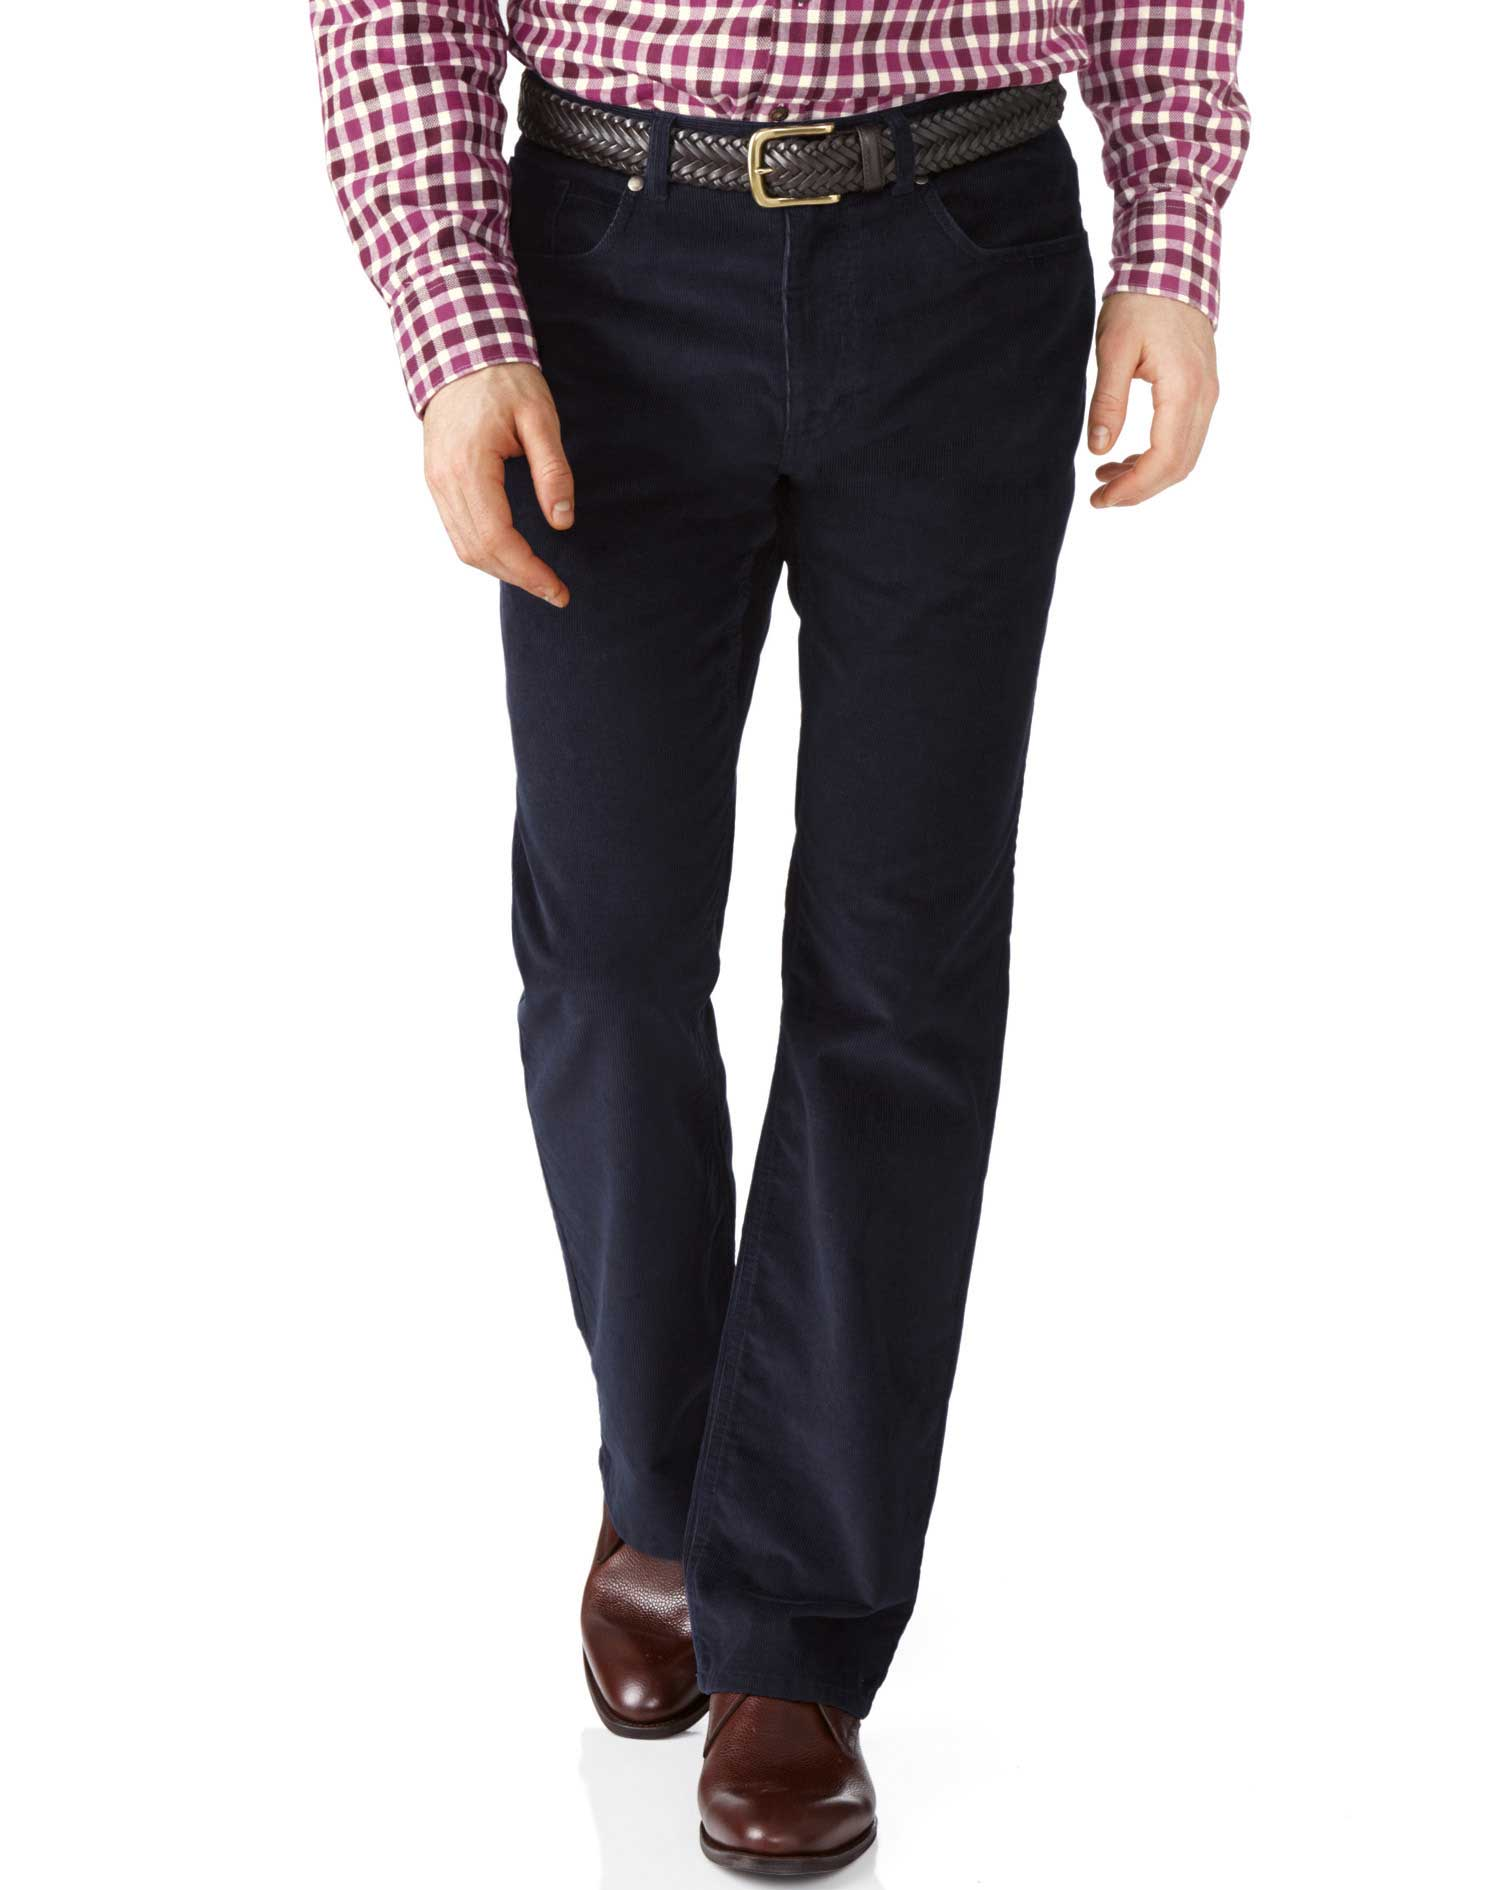 Dark Navy Classic Fit Stretch 5 Pocket Needle Cord Trouser Size W42 L32 by Charles Tyrwhitt